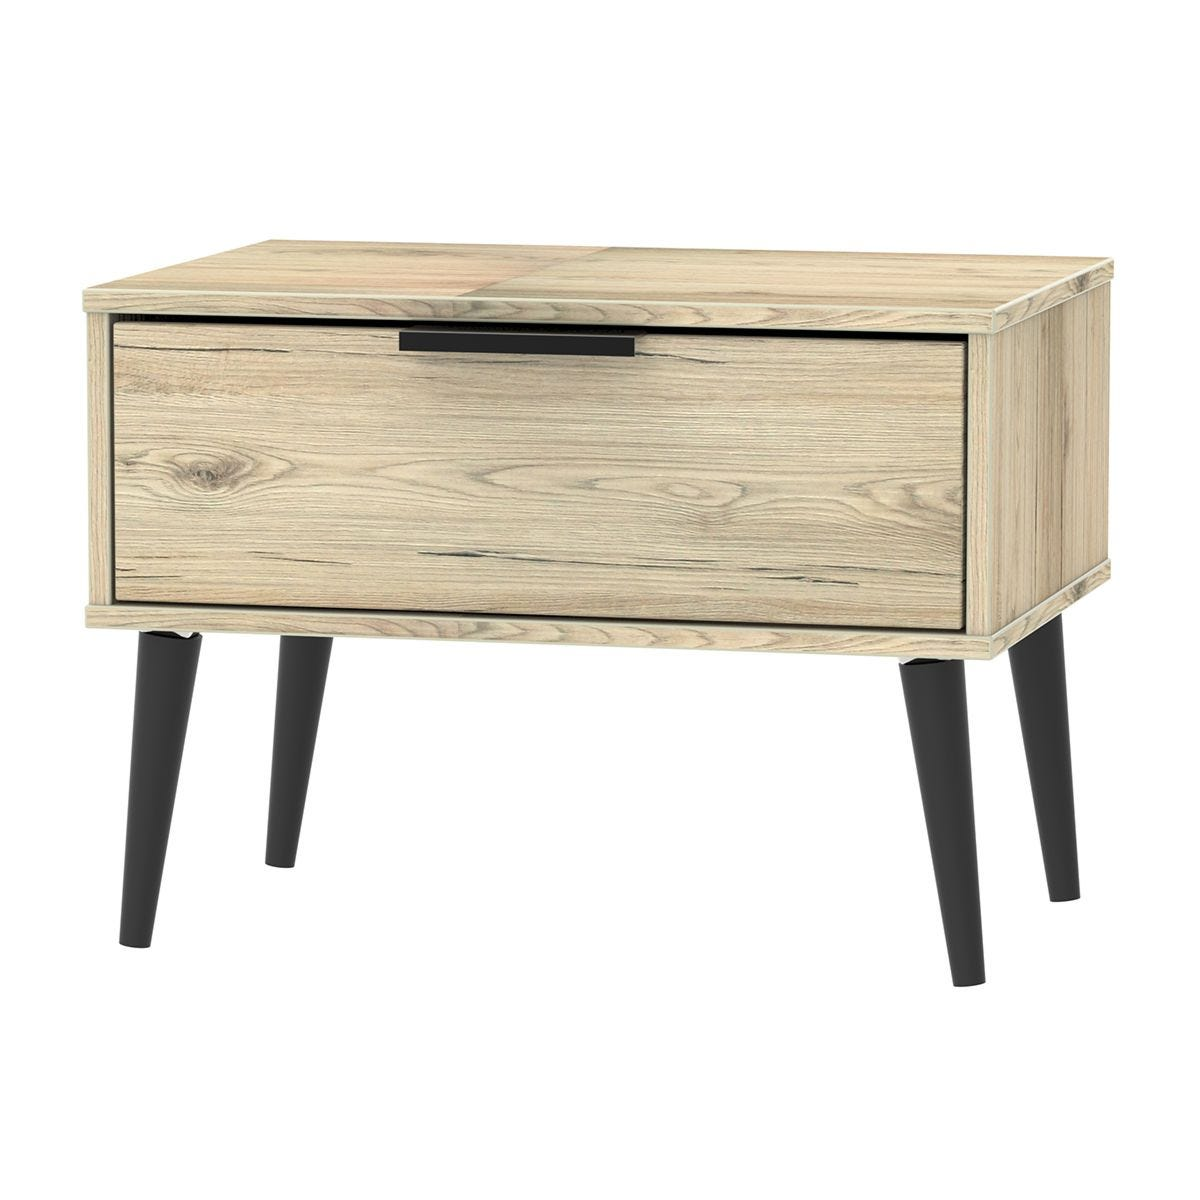 Hirato 1 Drawer Rustic Oak Midi Chest With Black Wooden Legs